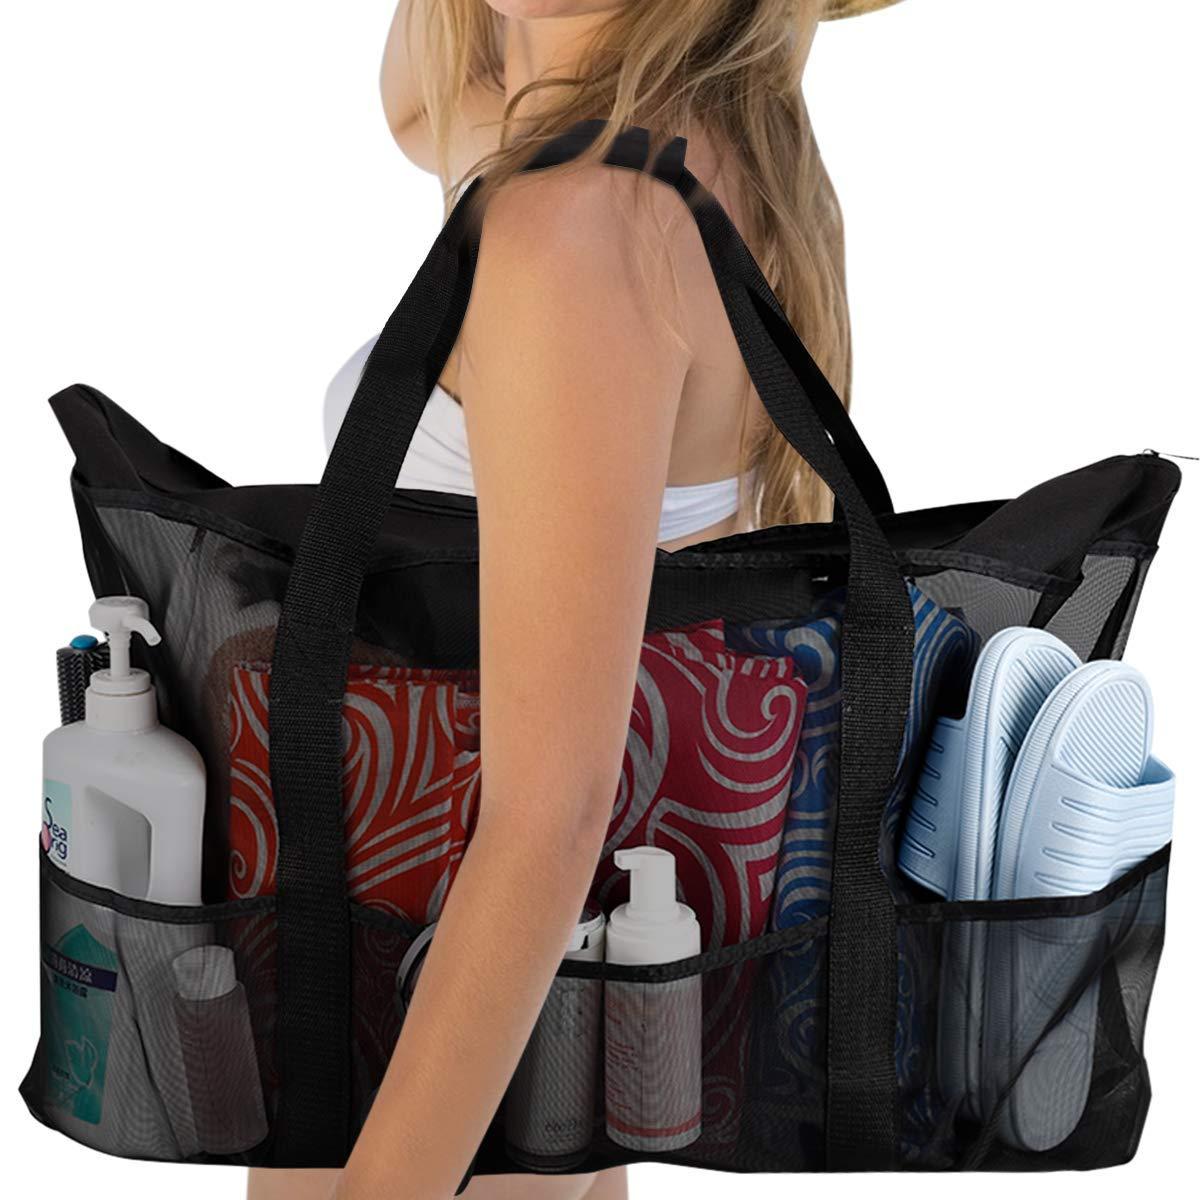 Extra Large Beach Bag XXL Mesh Tote with Zipper & 8 Pockets Heavy Duty